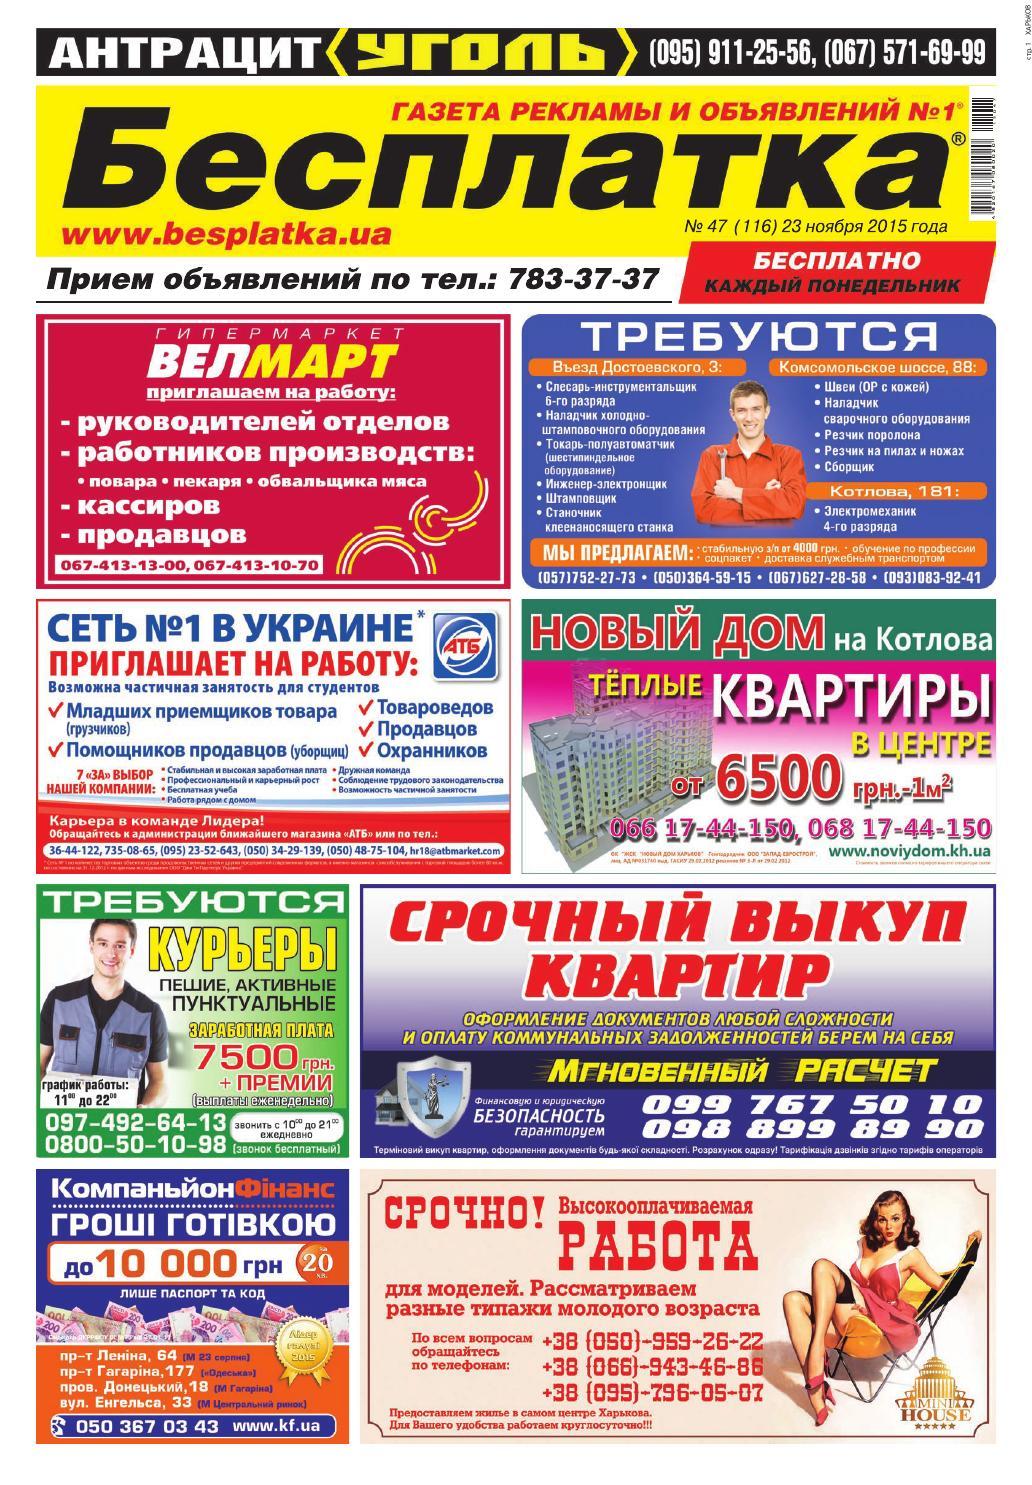 Besplatka  47 Харьков by besplatka ukraine - issuu 5a630077cf3